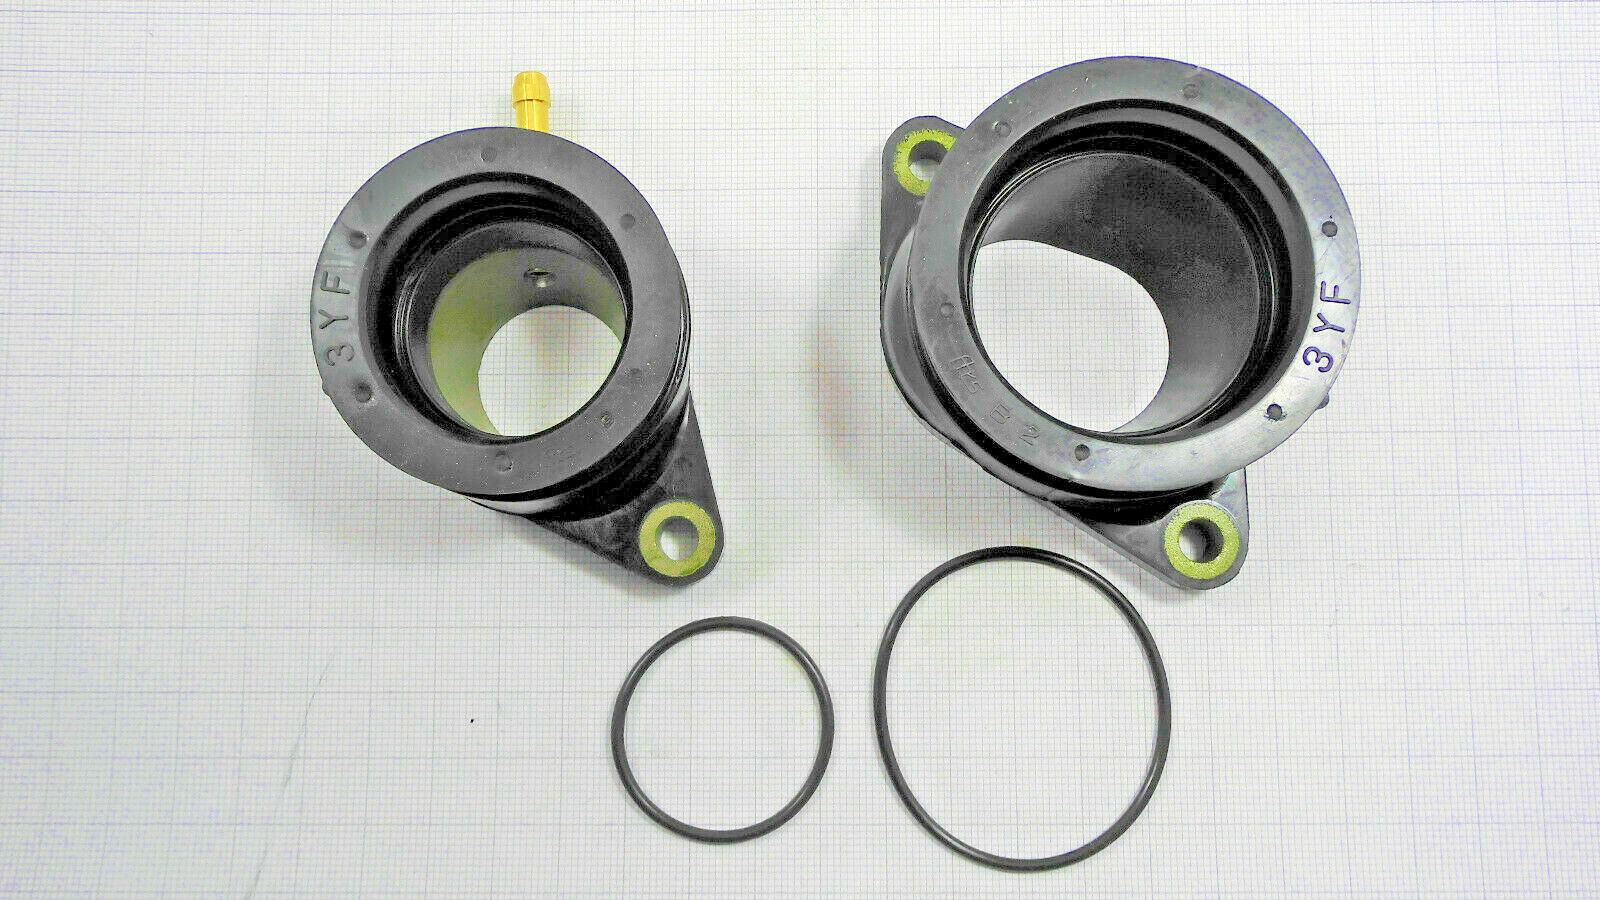 passend f/ür Aprilia Classic 125 Bj.1996 MF AFAM Kettensatz Stahl 15-40-112 AFAM520MR2-G offen mit Clipschloss